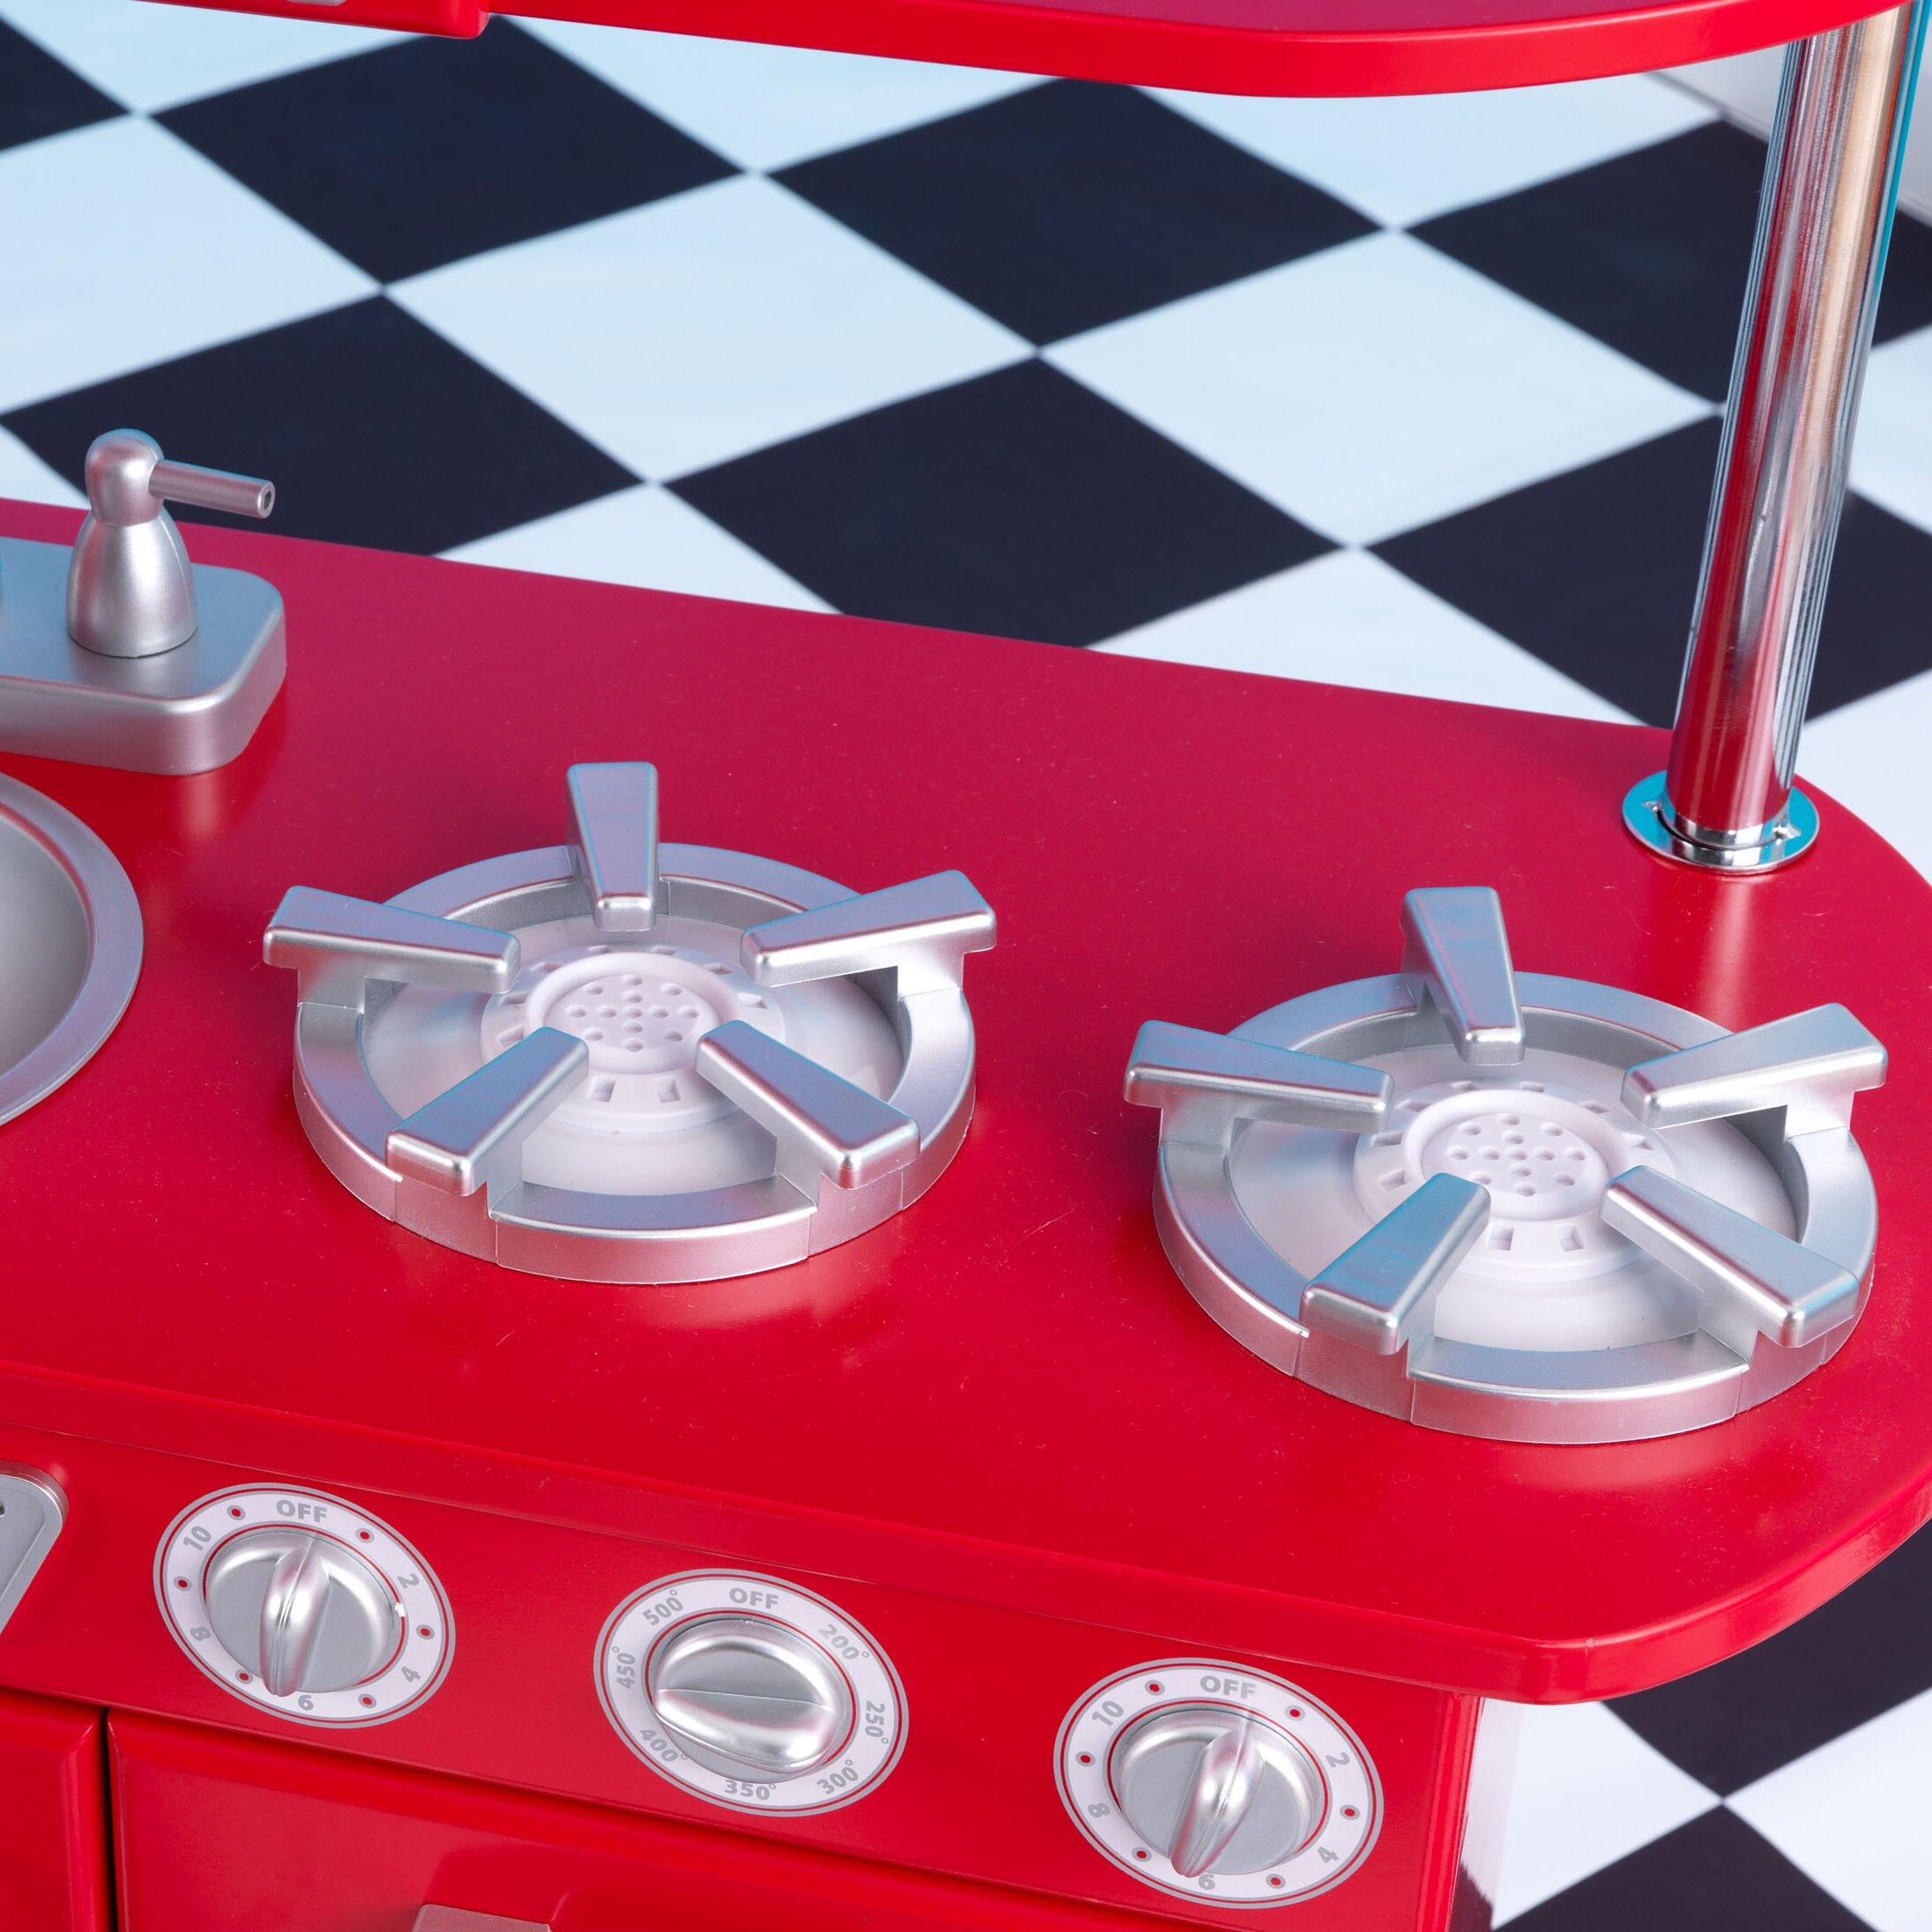 KidKraft Personalized Red Vintage Kitchen & Reviews